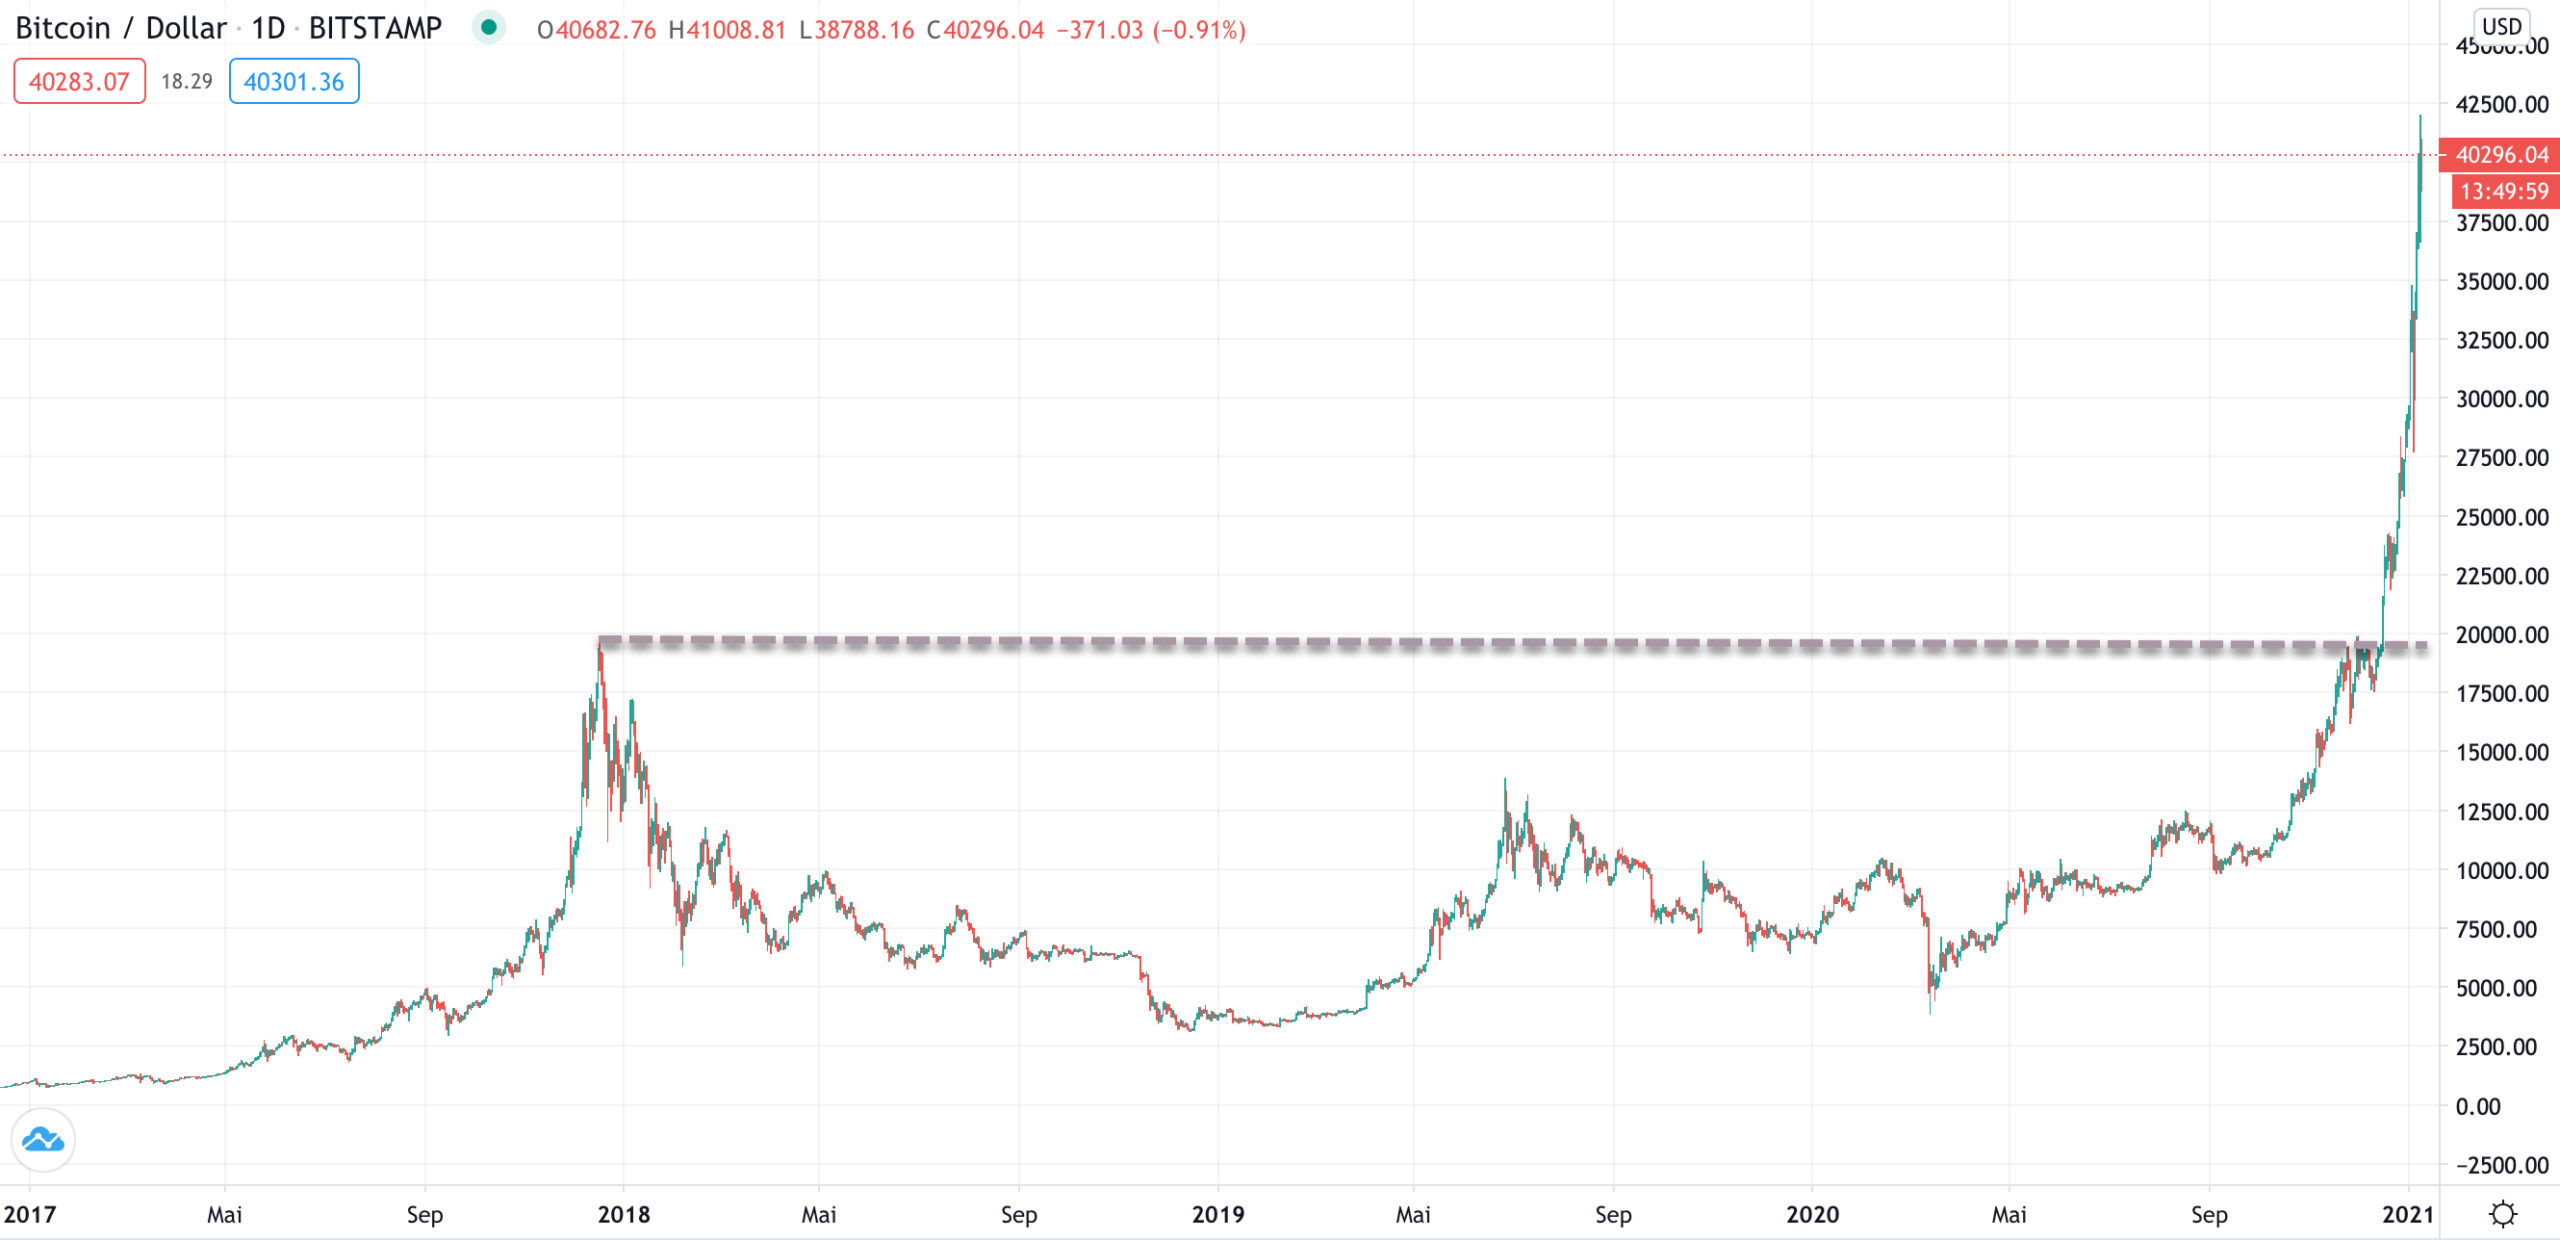 Rallye im Bitcoin